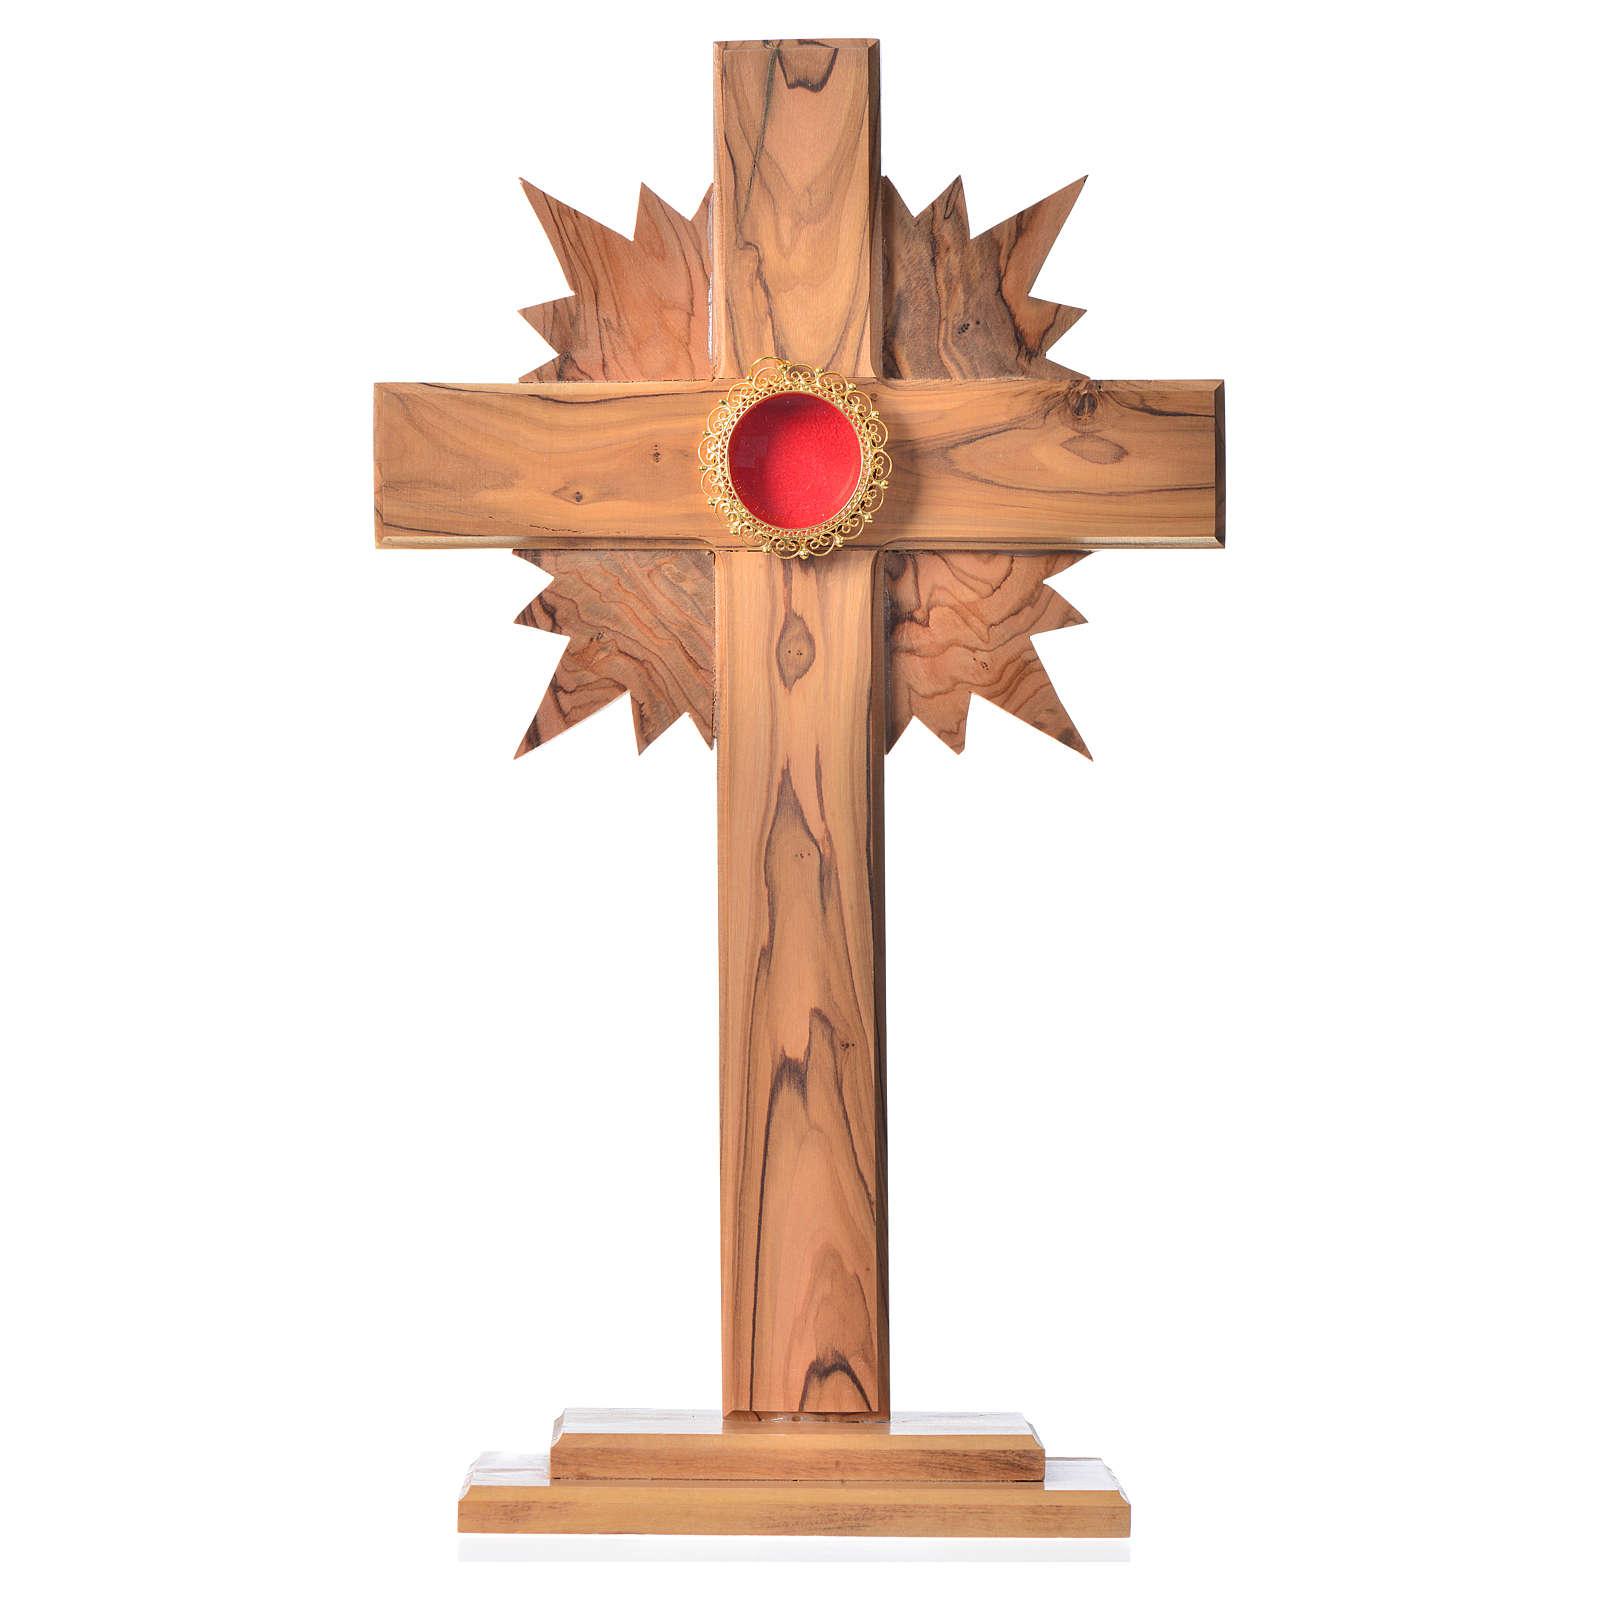 Relicario olivo 29cm, cruz con rayos custodia plata 800 redonda 4